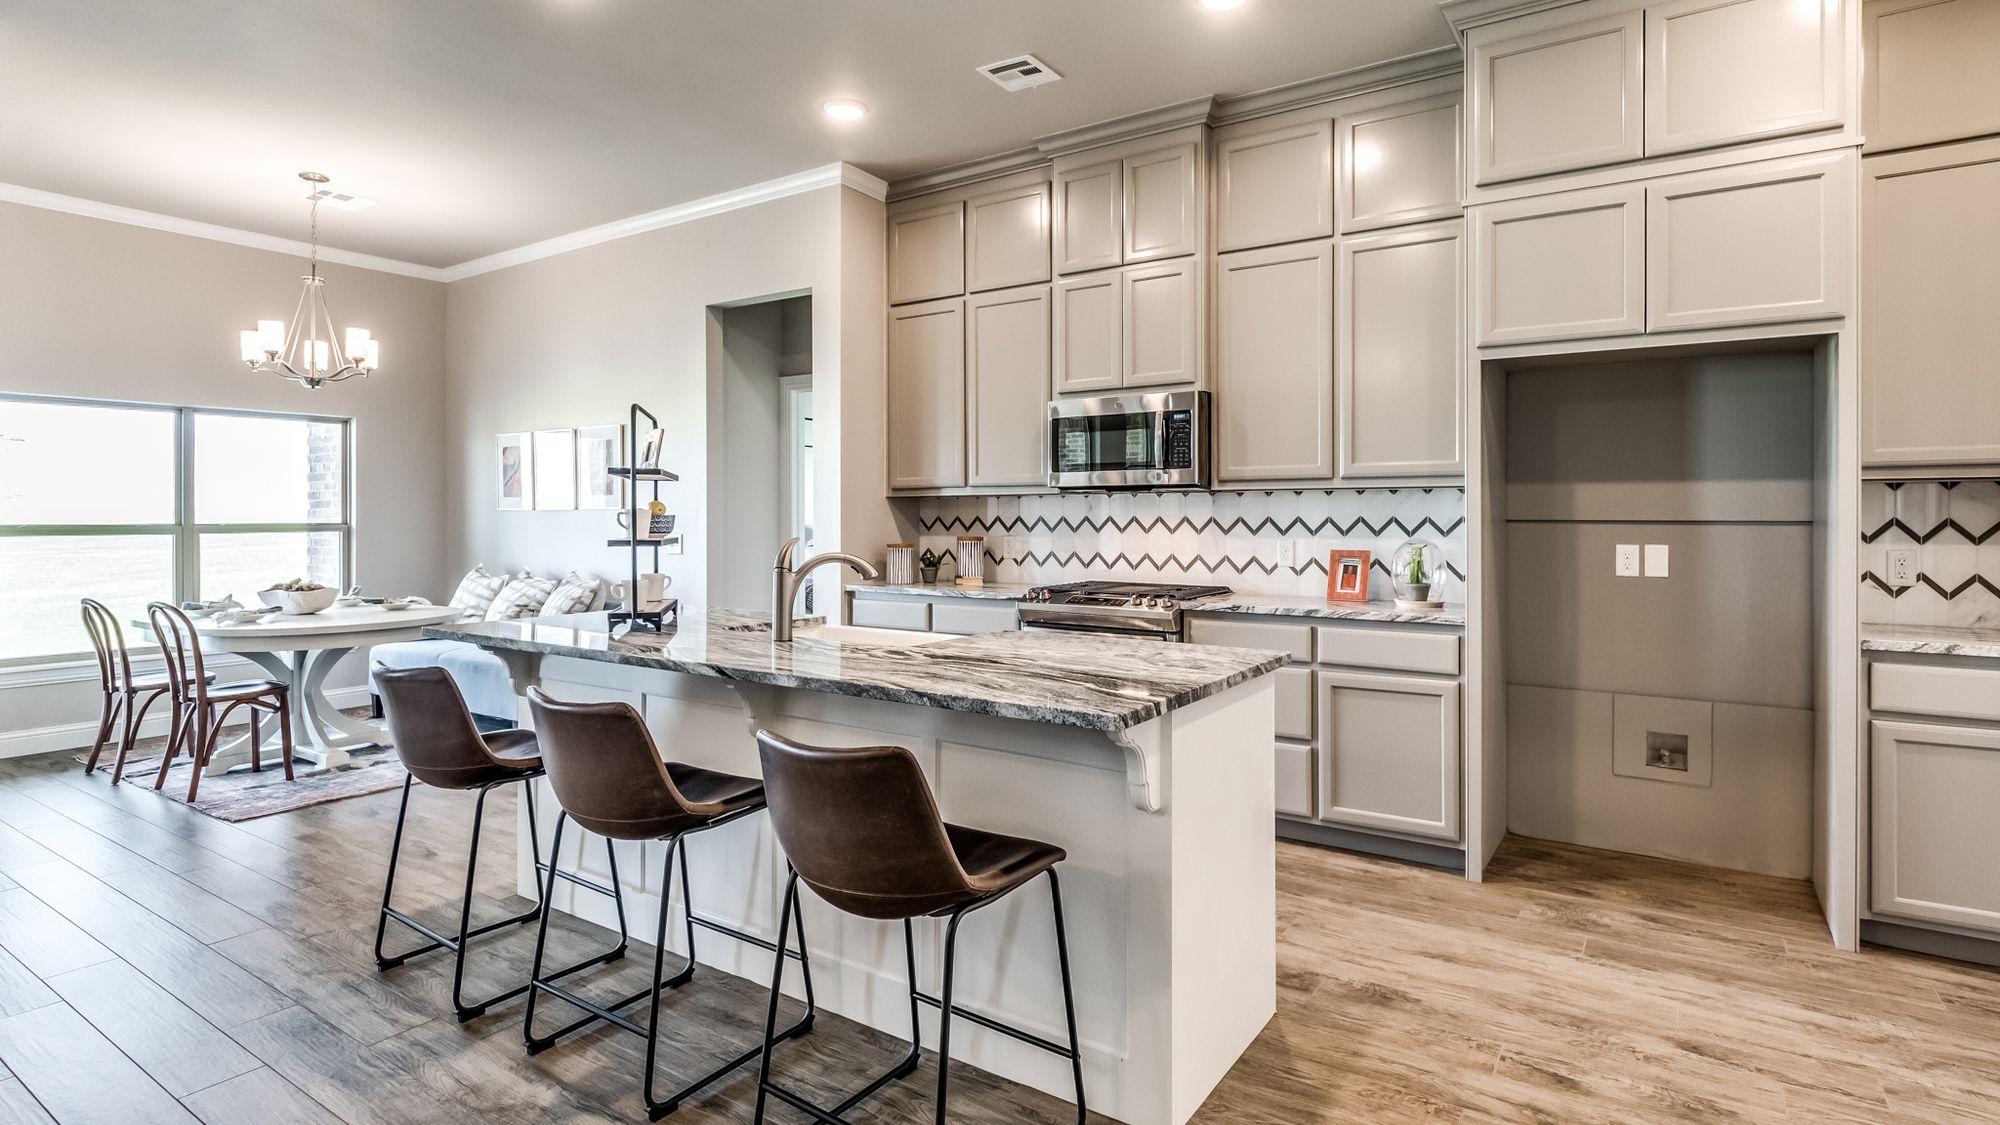 Cambria Heights, Edmond Public Schools, Oklahoma Home Builder, Oklahoma Builder, New Home, Home For Sale